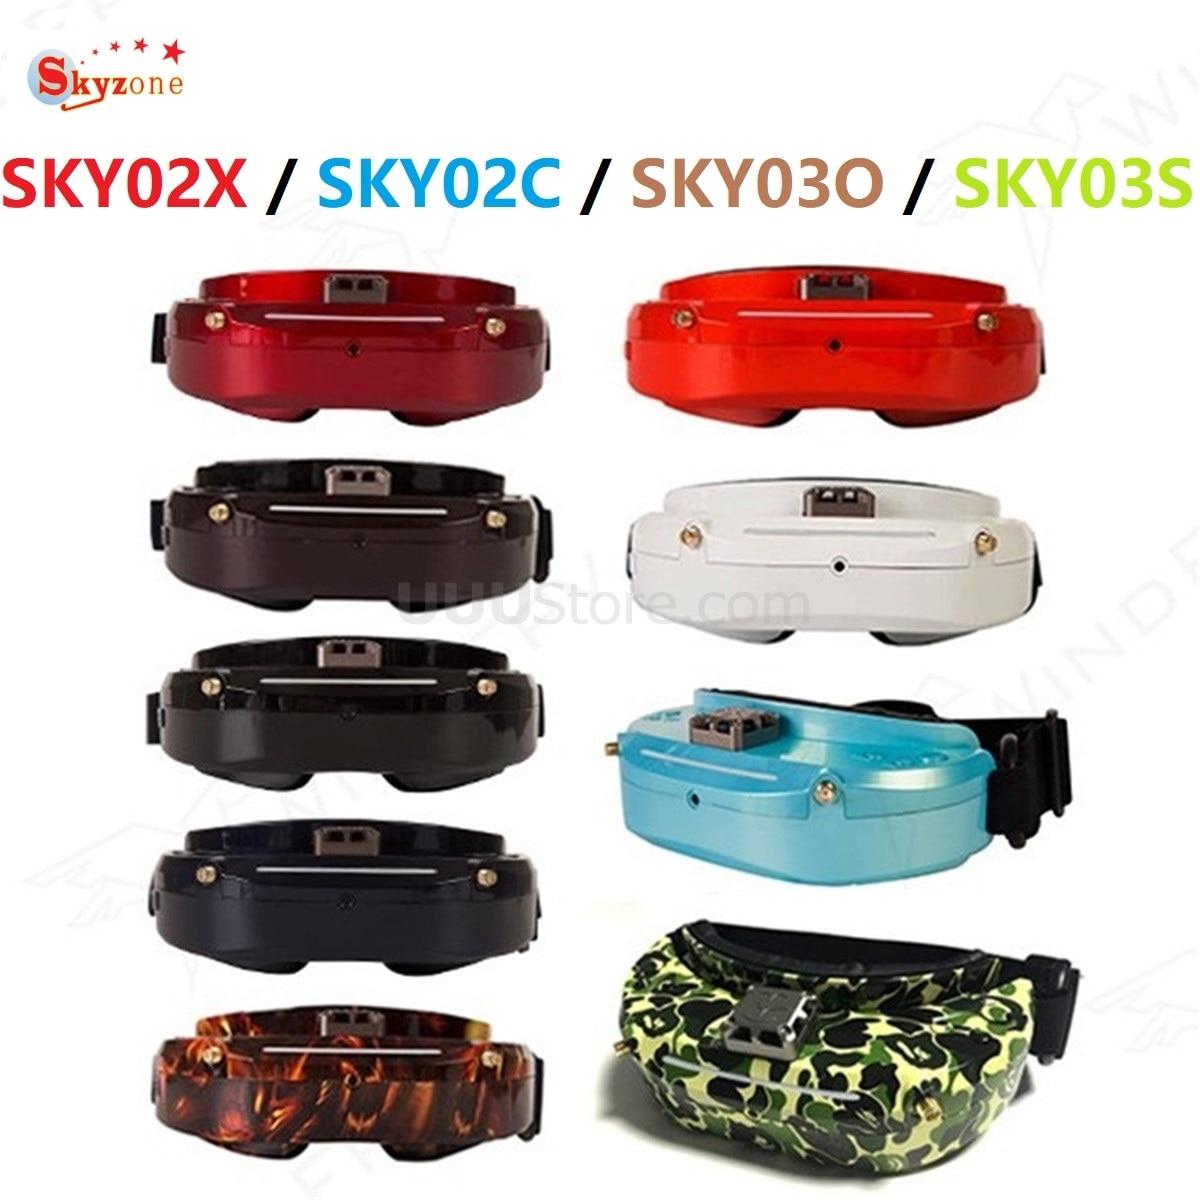 Skyzone SKY02X / SKY02C / SKY03O / SKY03S Oled 5,8 GHz 48CH la diversidad FPV gafas de apoyo OSD DVR HDMI con la cabeza rastreador ventilador LED